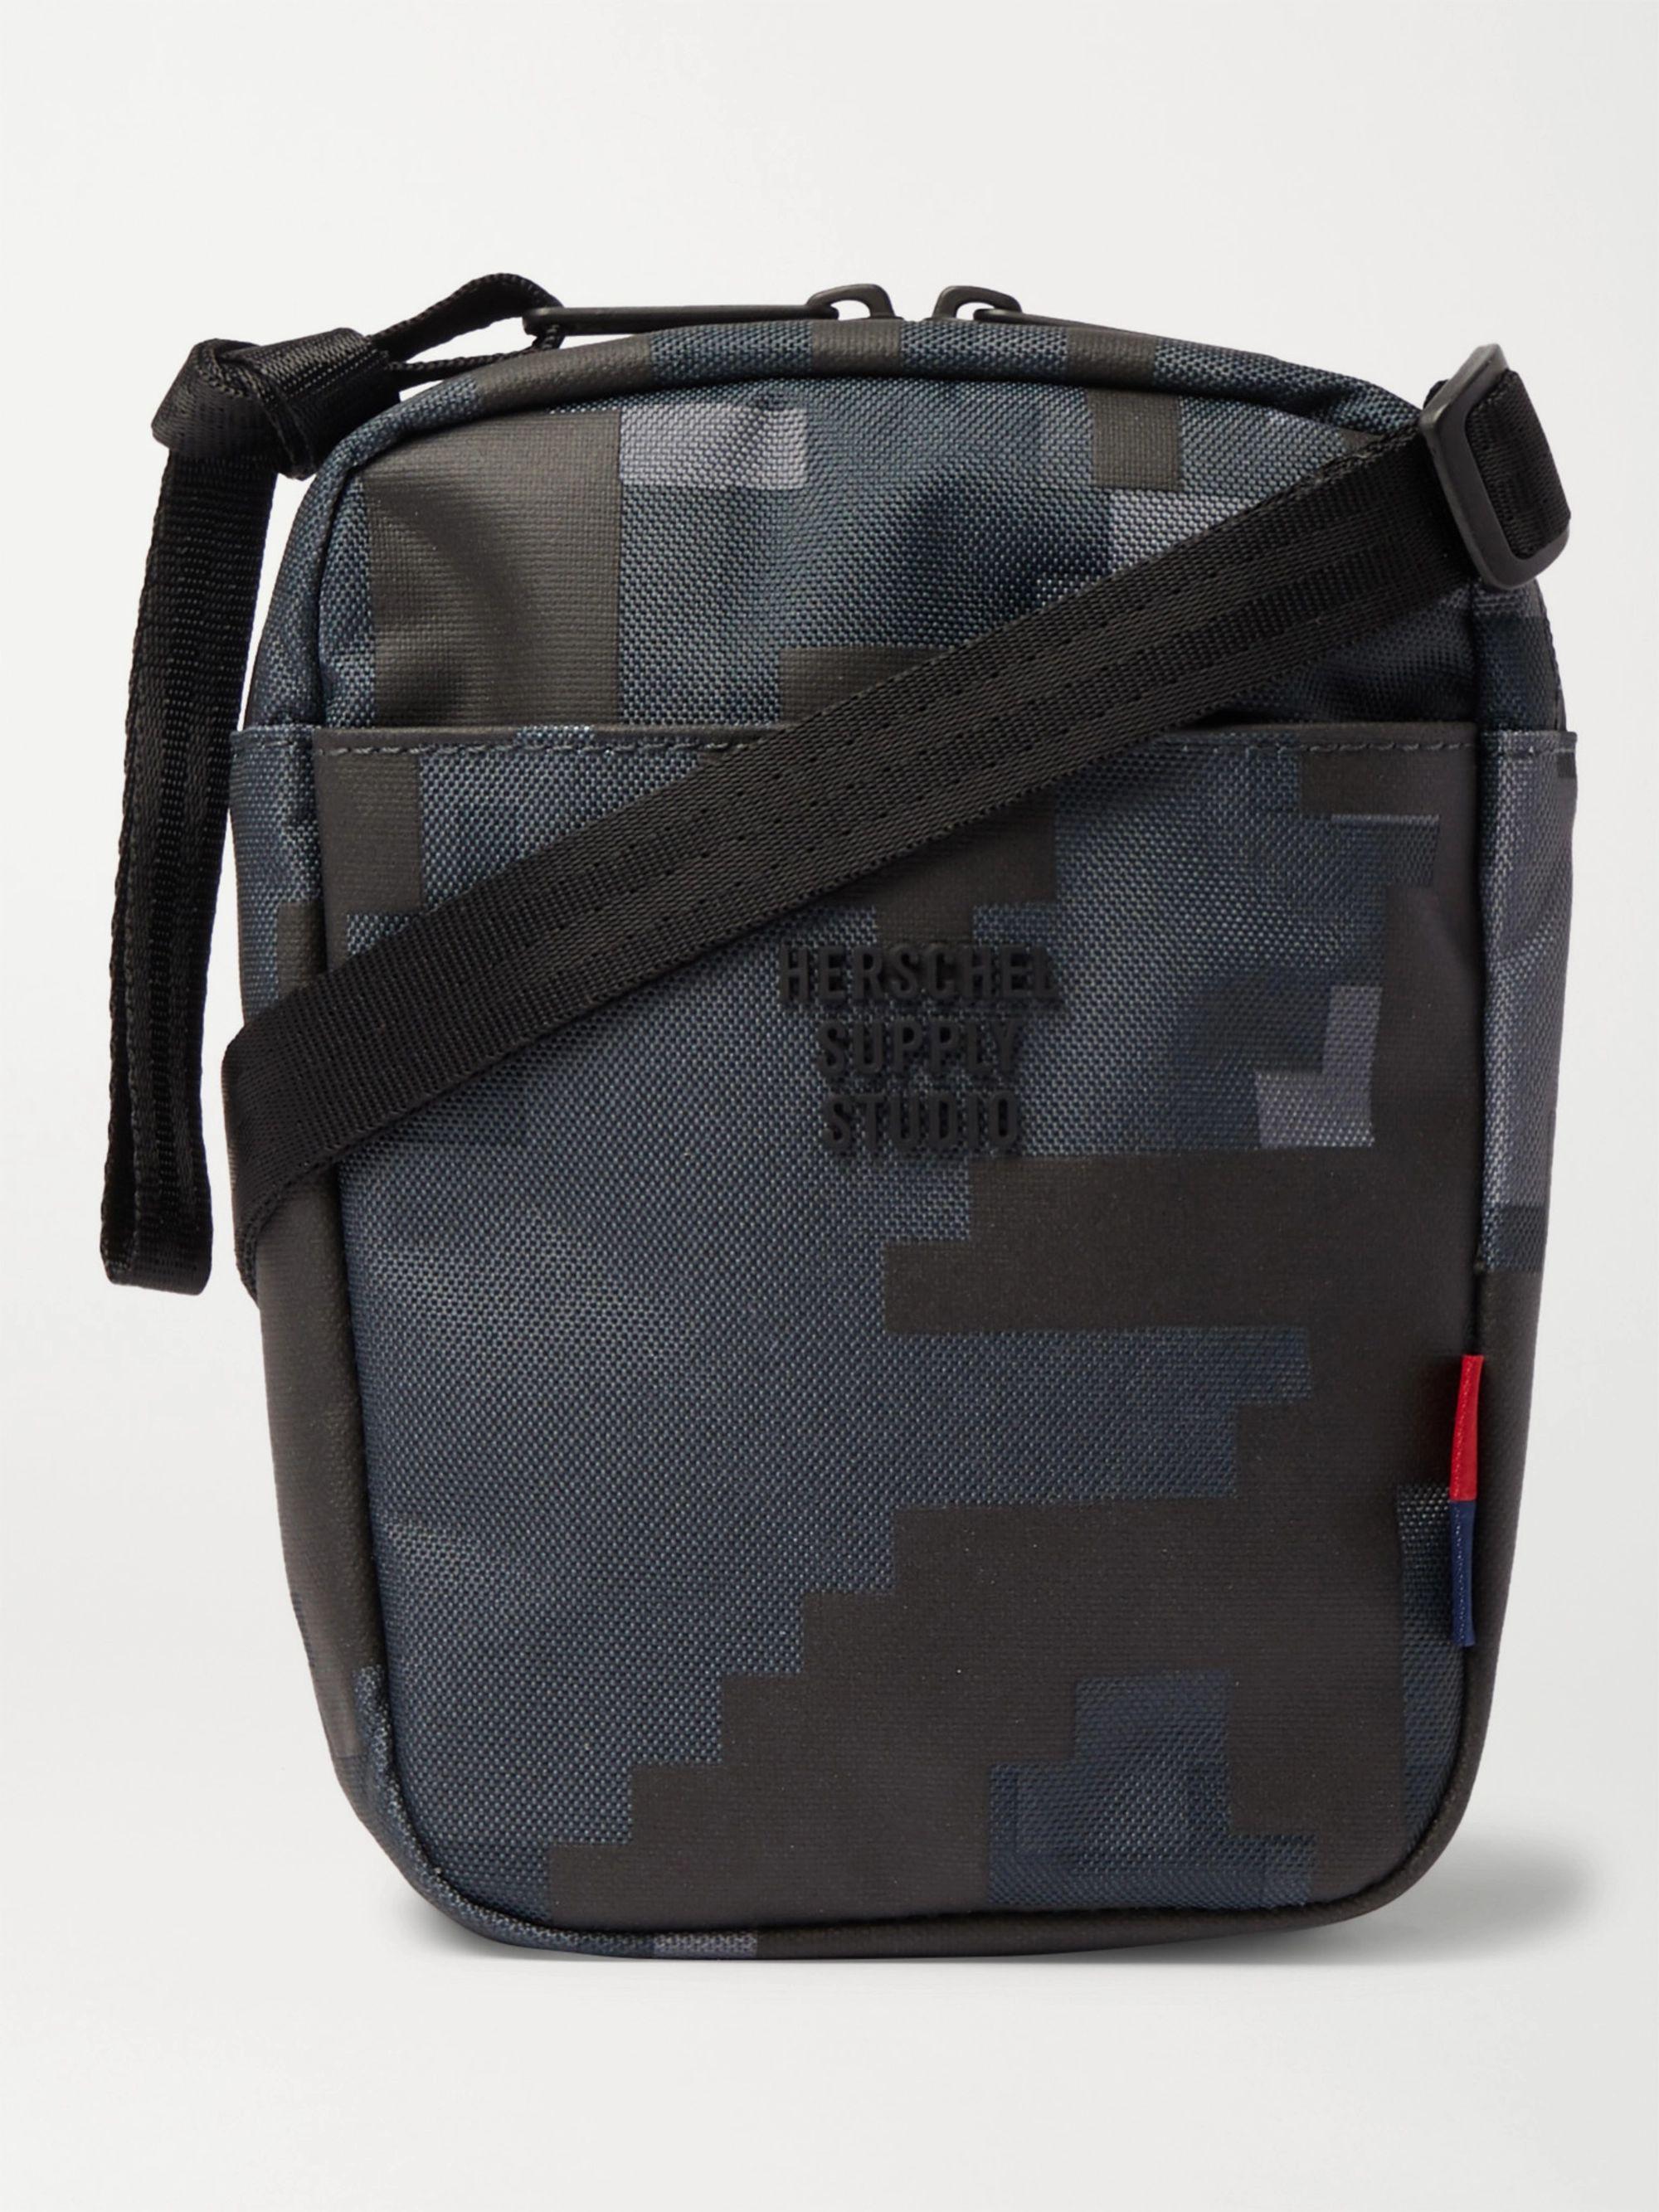 HERSCHEL SUPPLY CO Cruz Camouflage-Print Sailcloth Messenger Bag,Navy